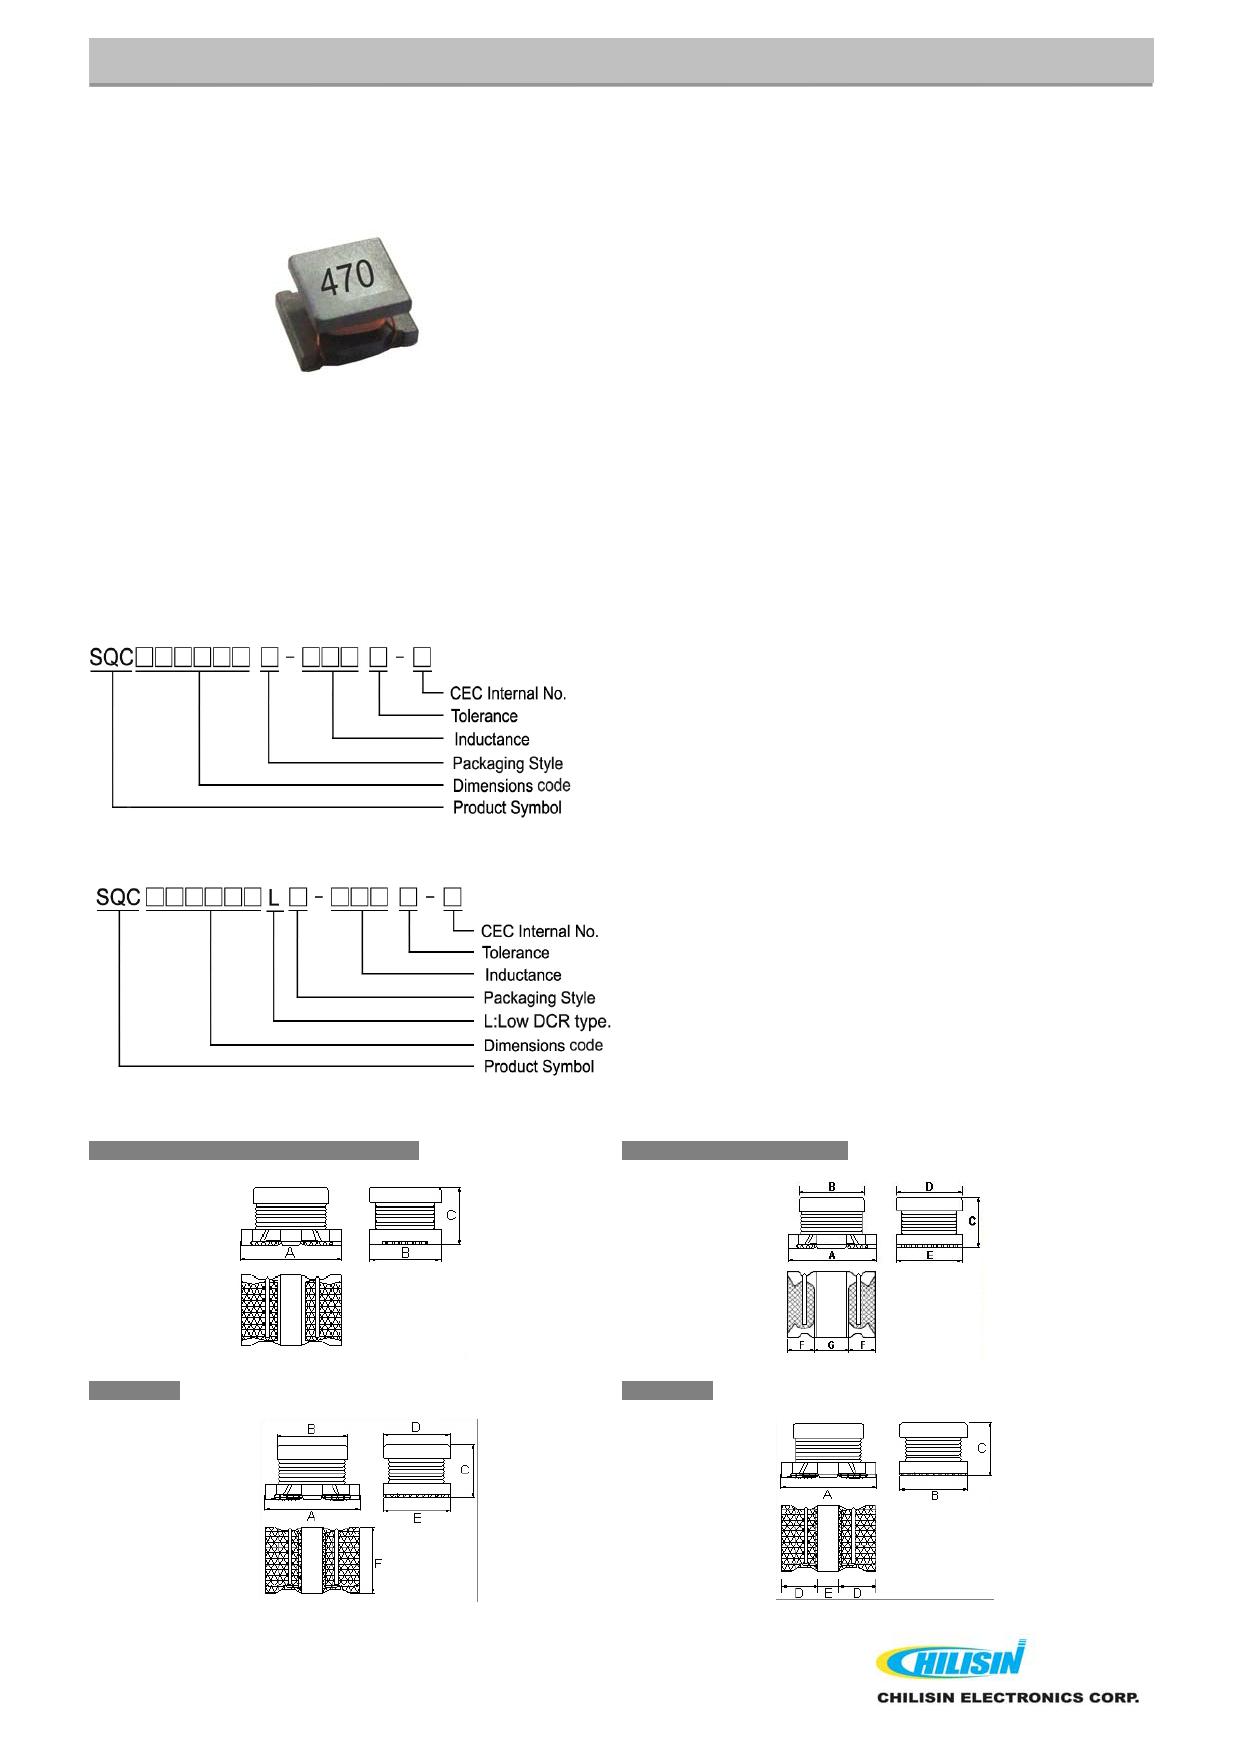 SQC322517T 데이터시트 및 SQC322517T PDF